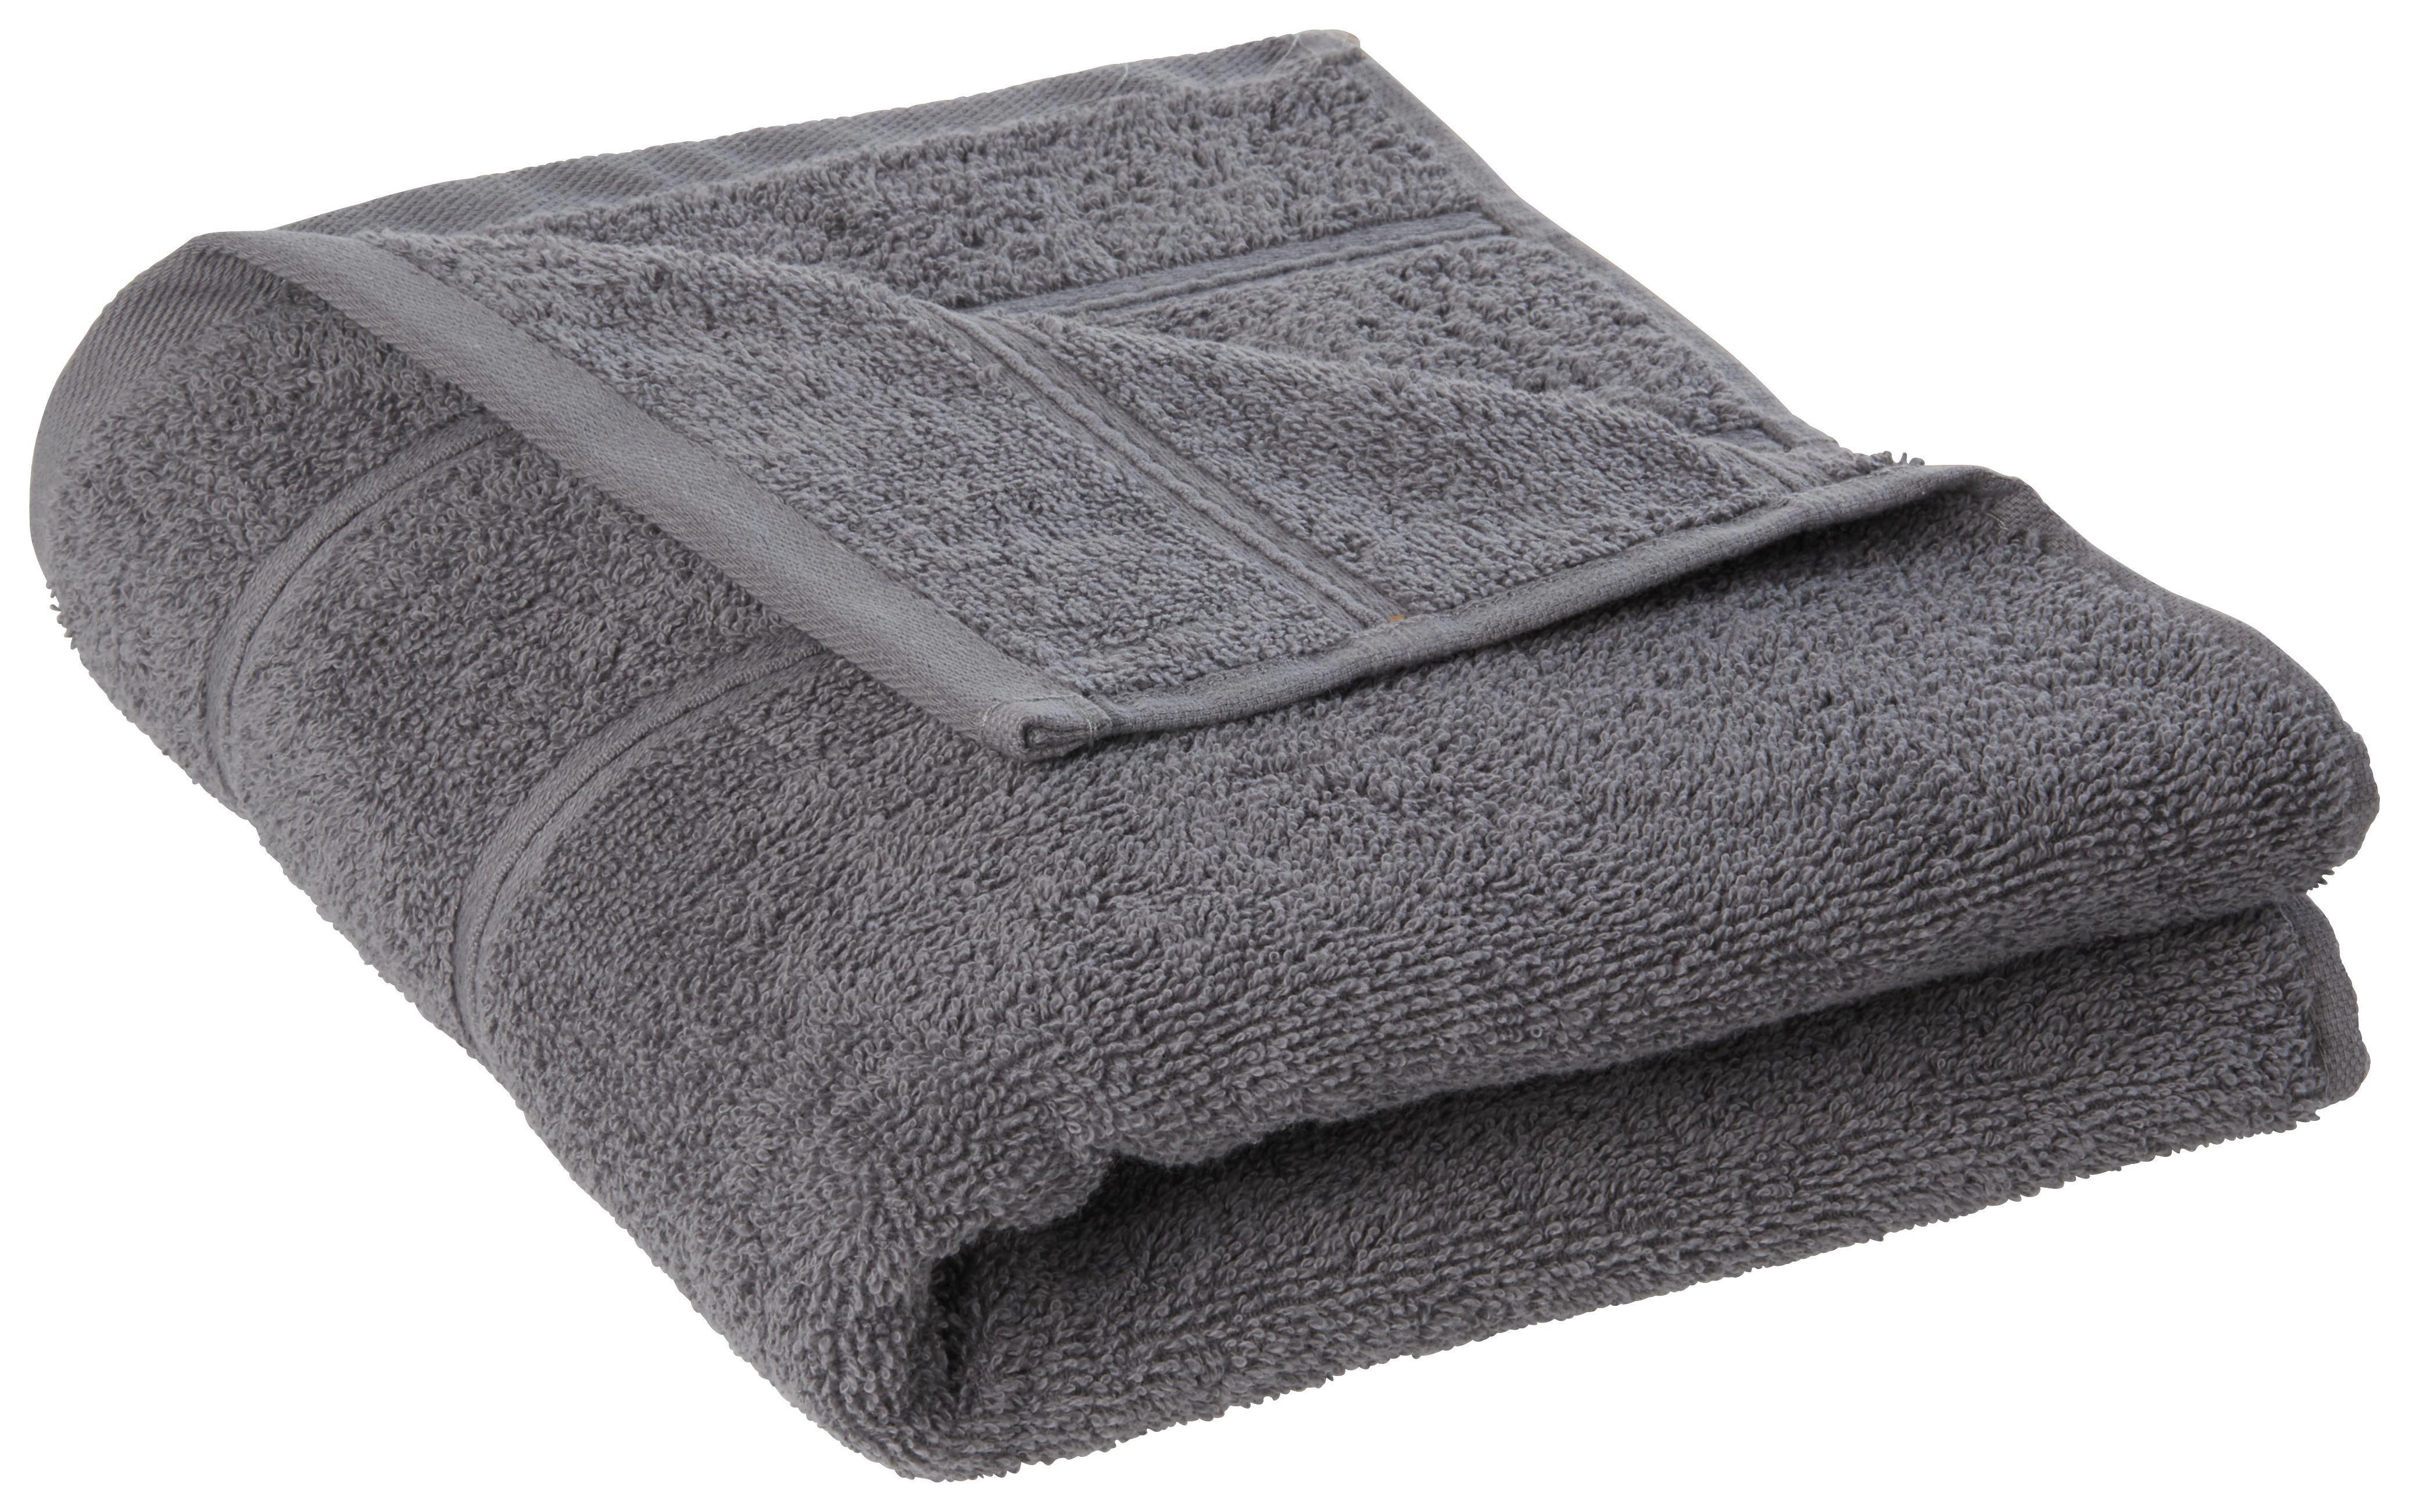 Brisača Melanie - antracit, tekstil (50/100cm) - MÖMAX modern living